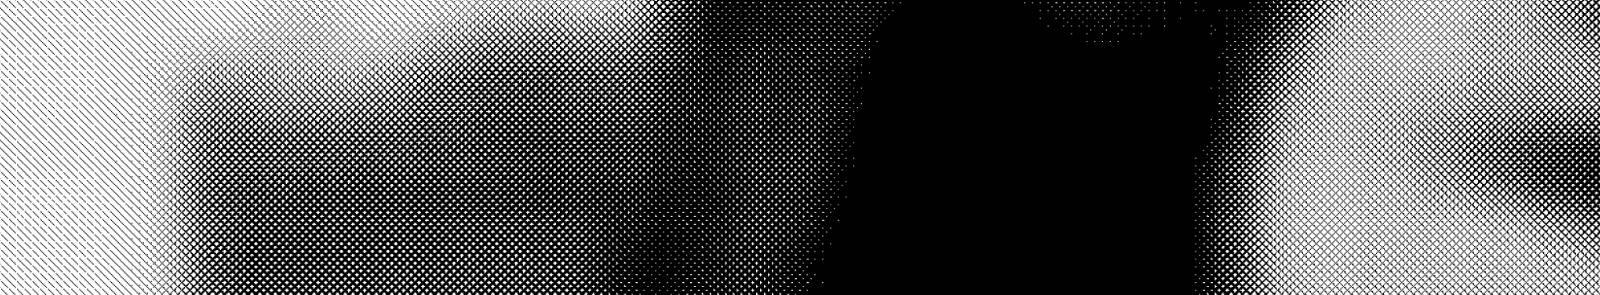 mfr093_website_banner